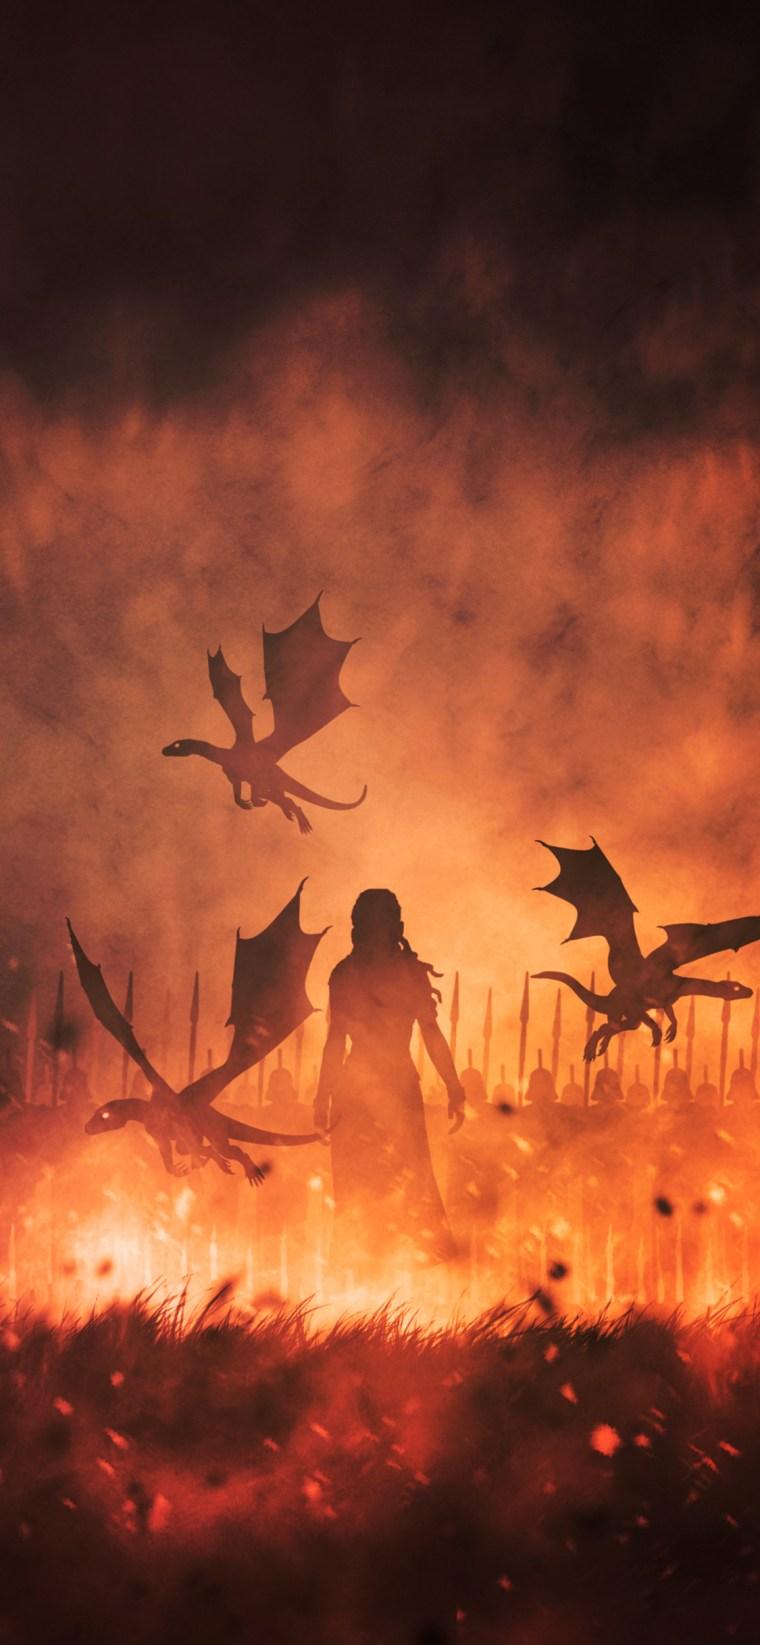 daenerys-targaryen-with-dragons-illustration-d5-1125x2436 iPhone game of thrones wallpaper